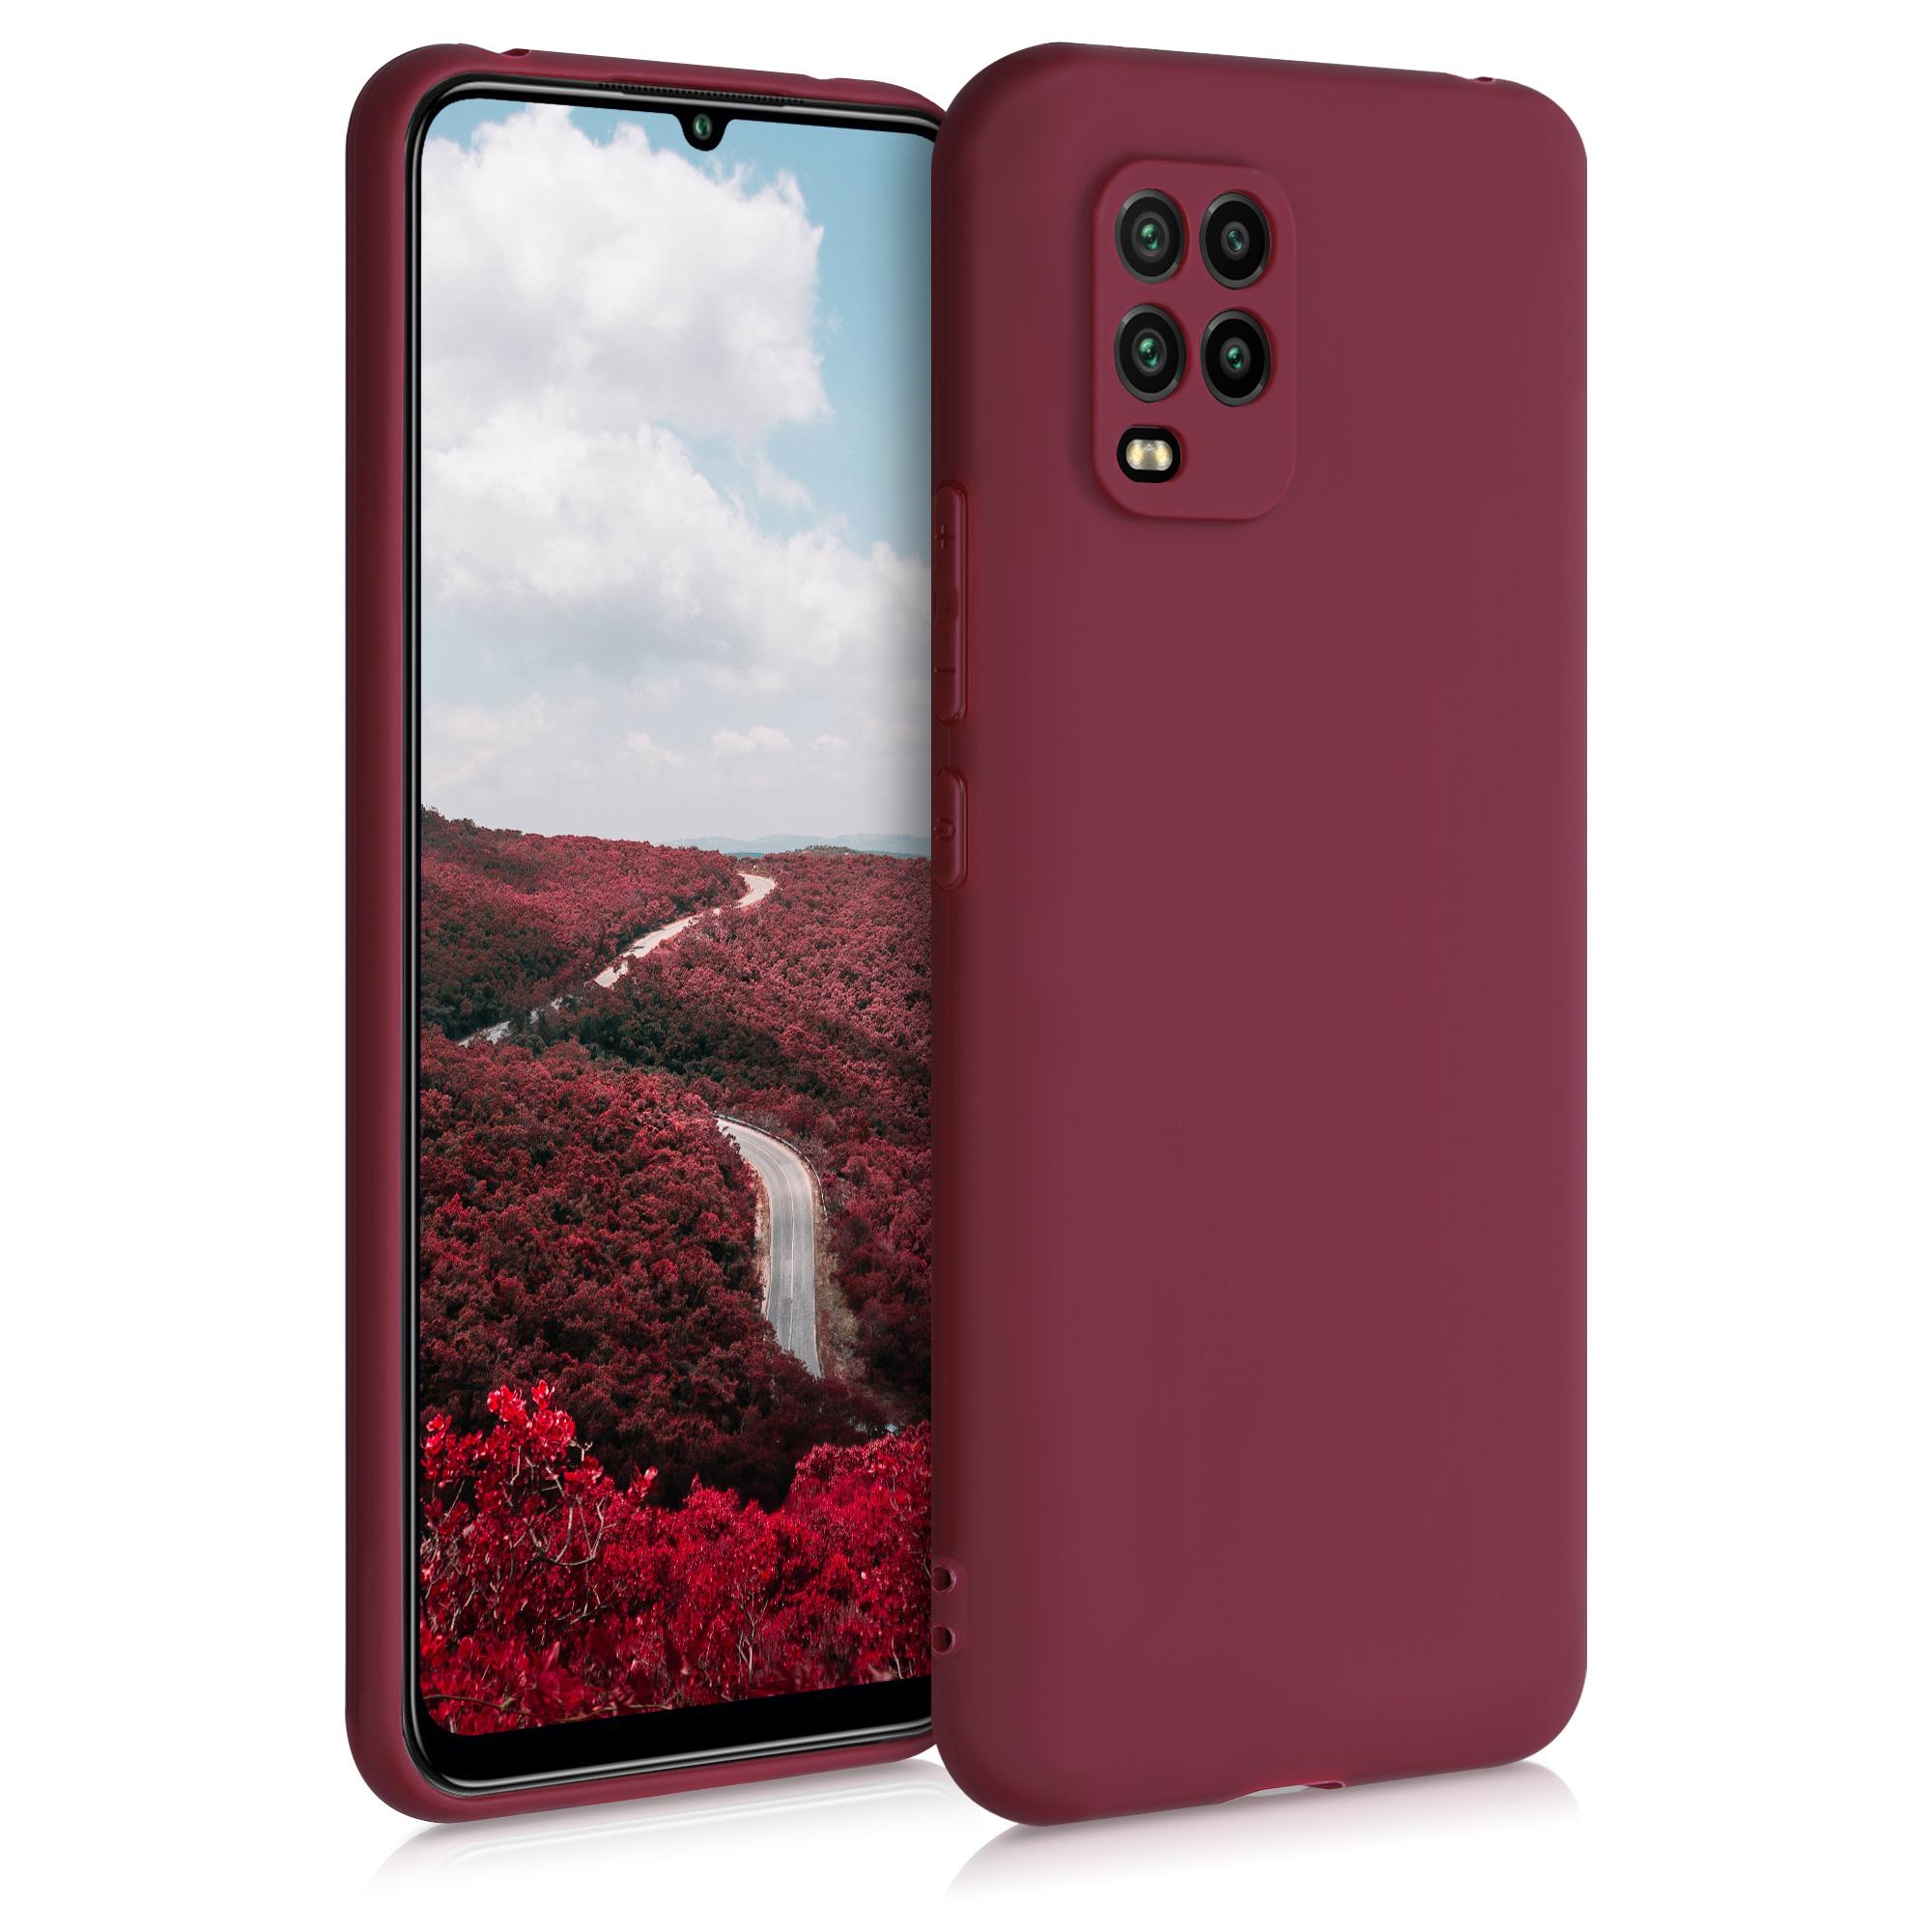 Rhubarb Red červené silikonové pouzdro / obal pro Xiaomi Mi 10 Lite